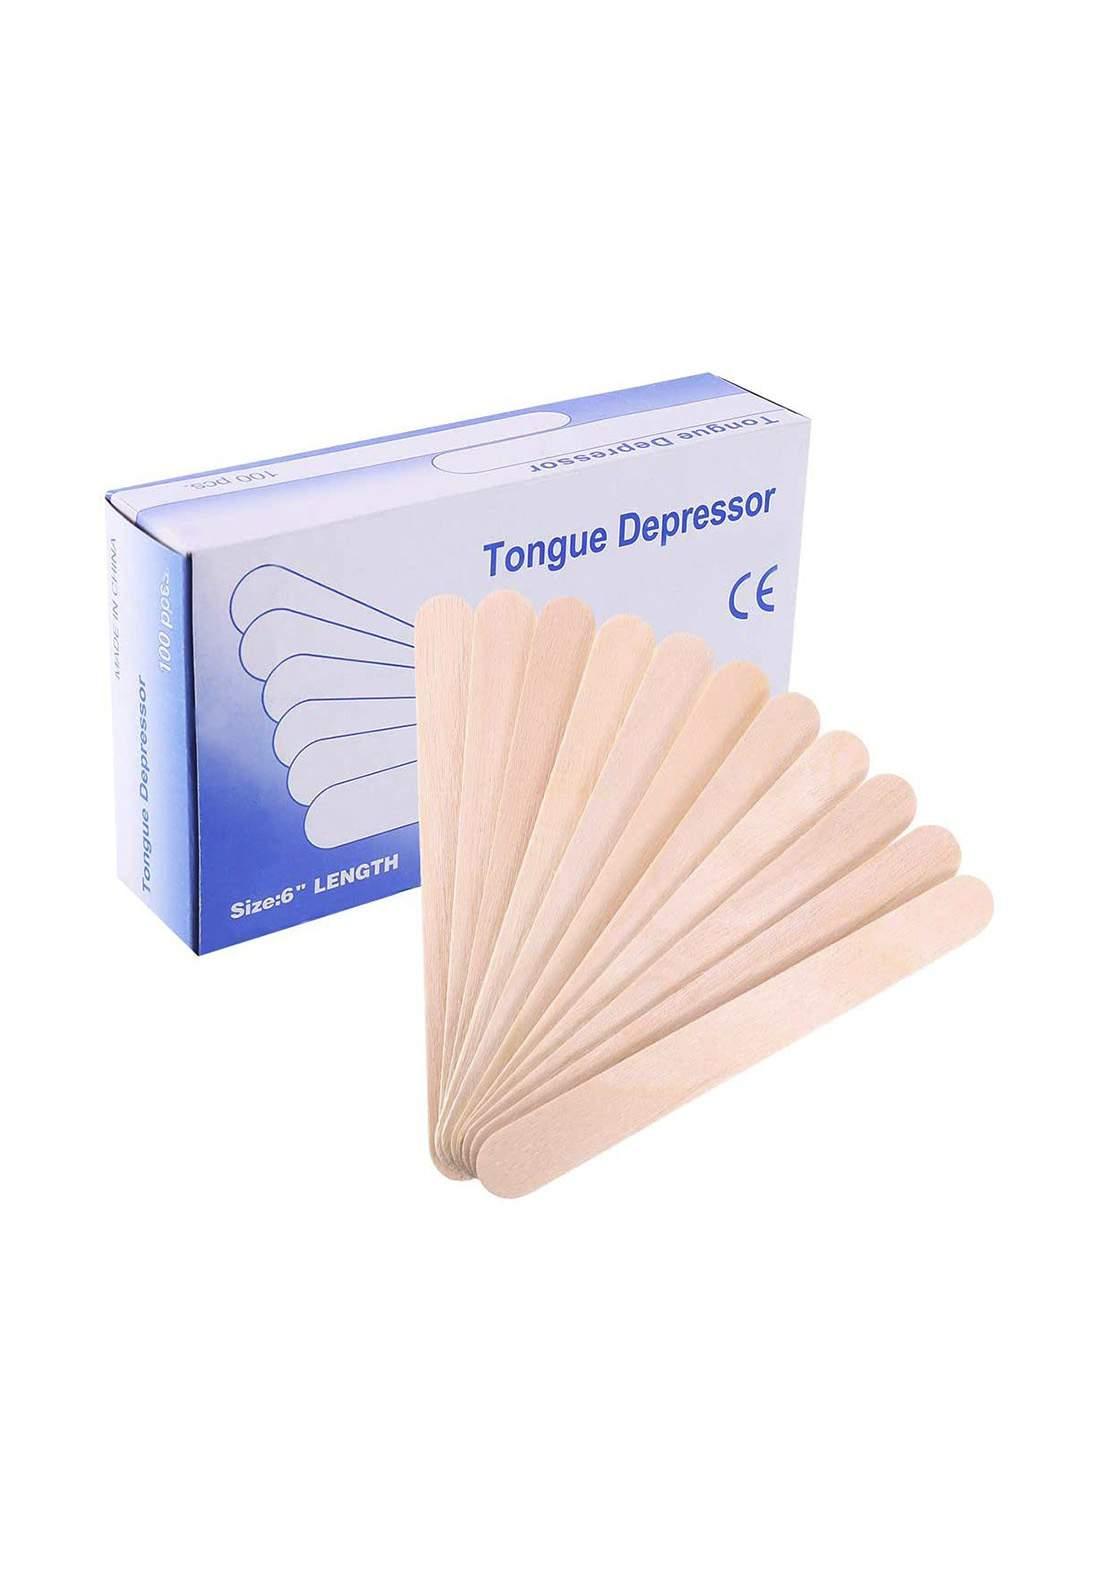 Wooden Tongue Depressor Size 6 100pcs عيدان خشبية